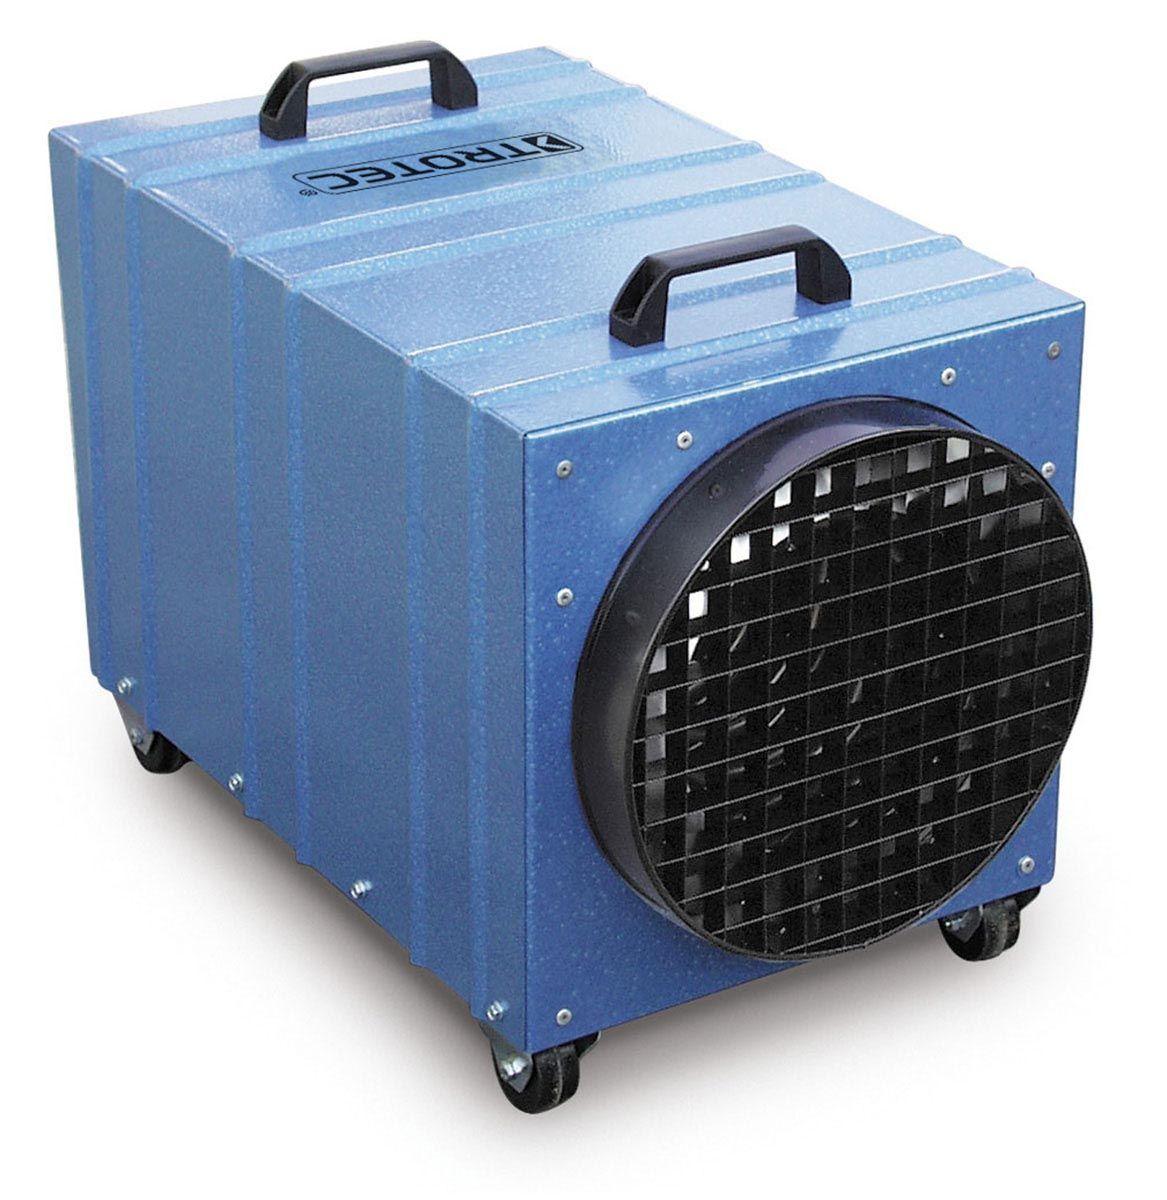 Elektroheizer Profi, TDE 65, blau/schwarz, 400 V, 6-9-12 kW, 600 m3/h